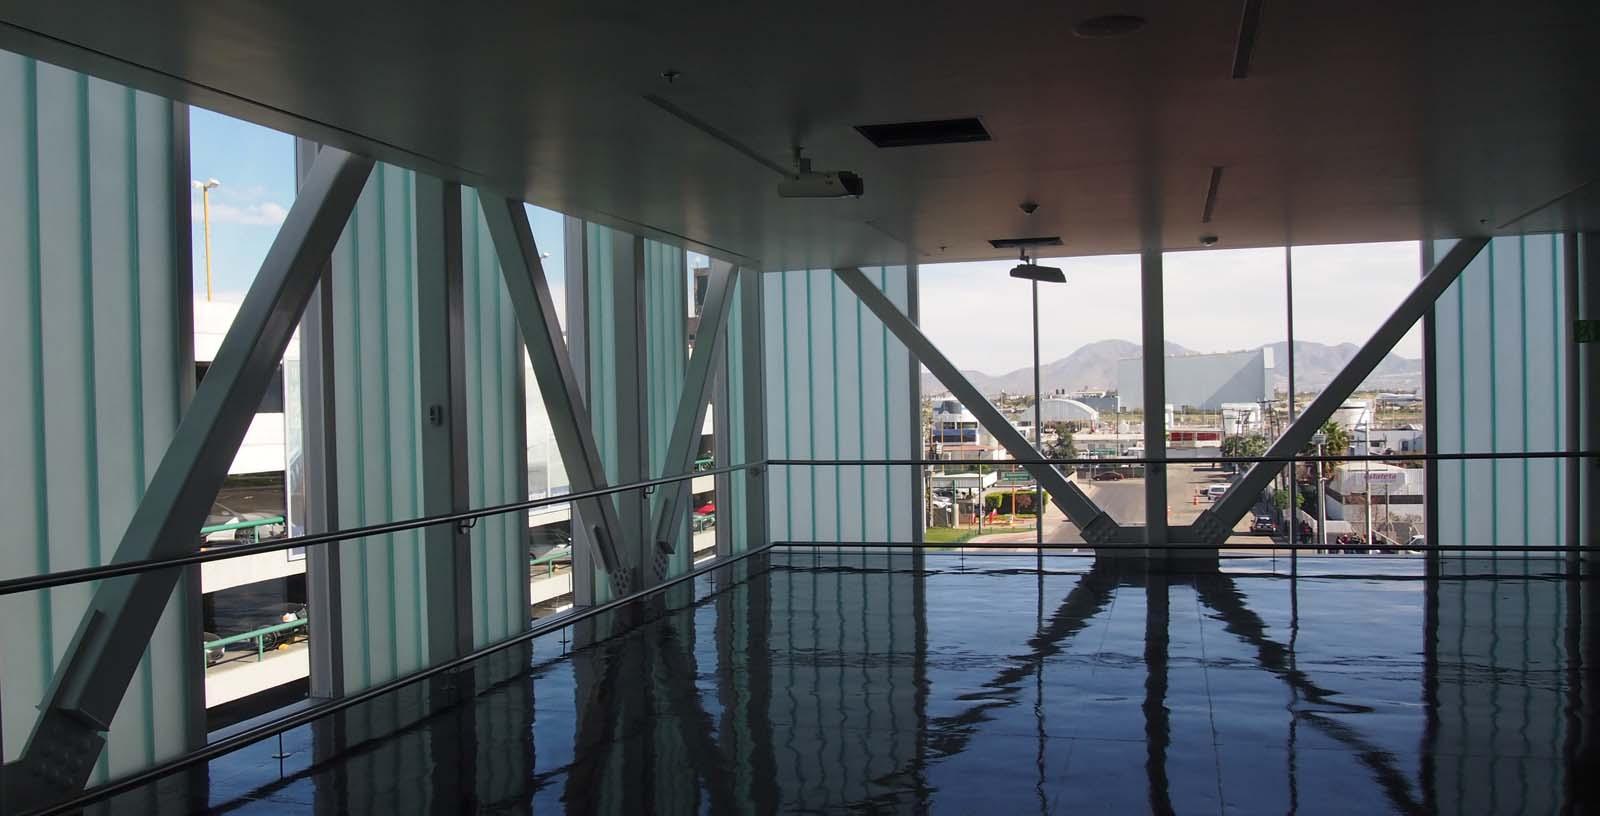 Cross-border_at_Tijuana_airport_04_Architecture_IDOM_photos_Pradip_J_Phanse